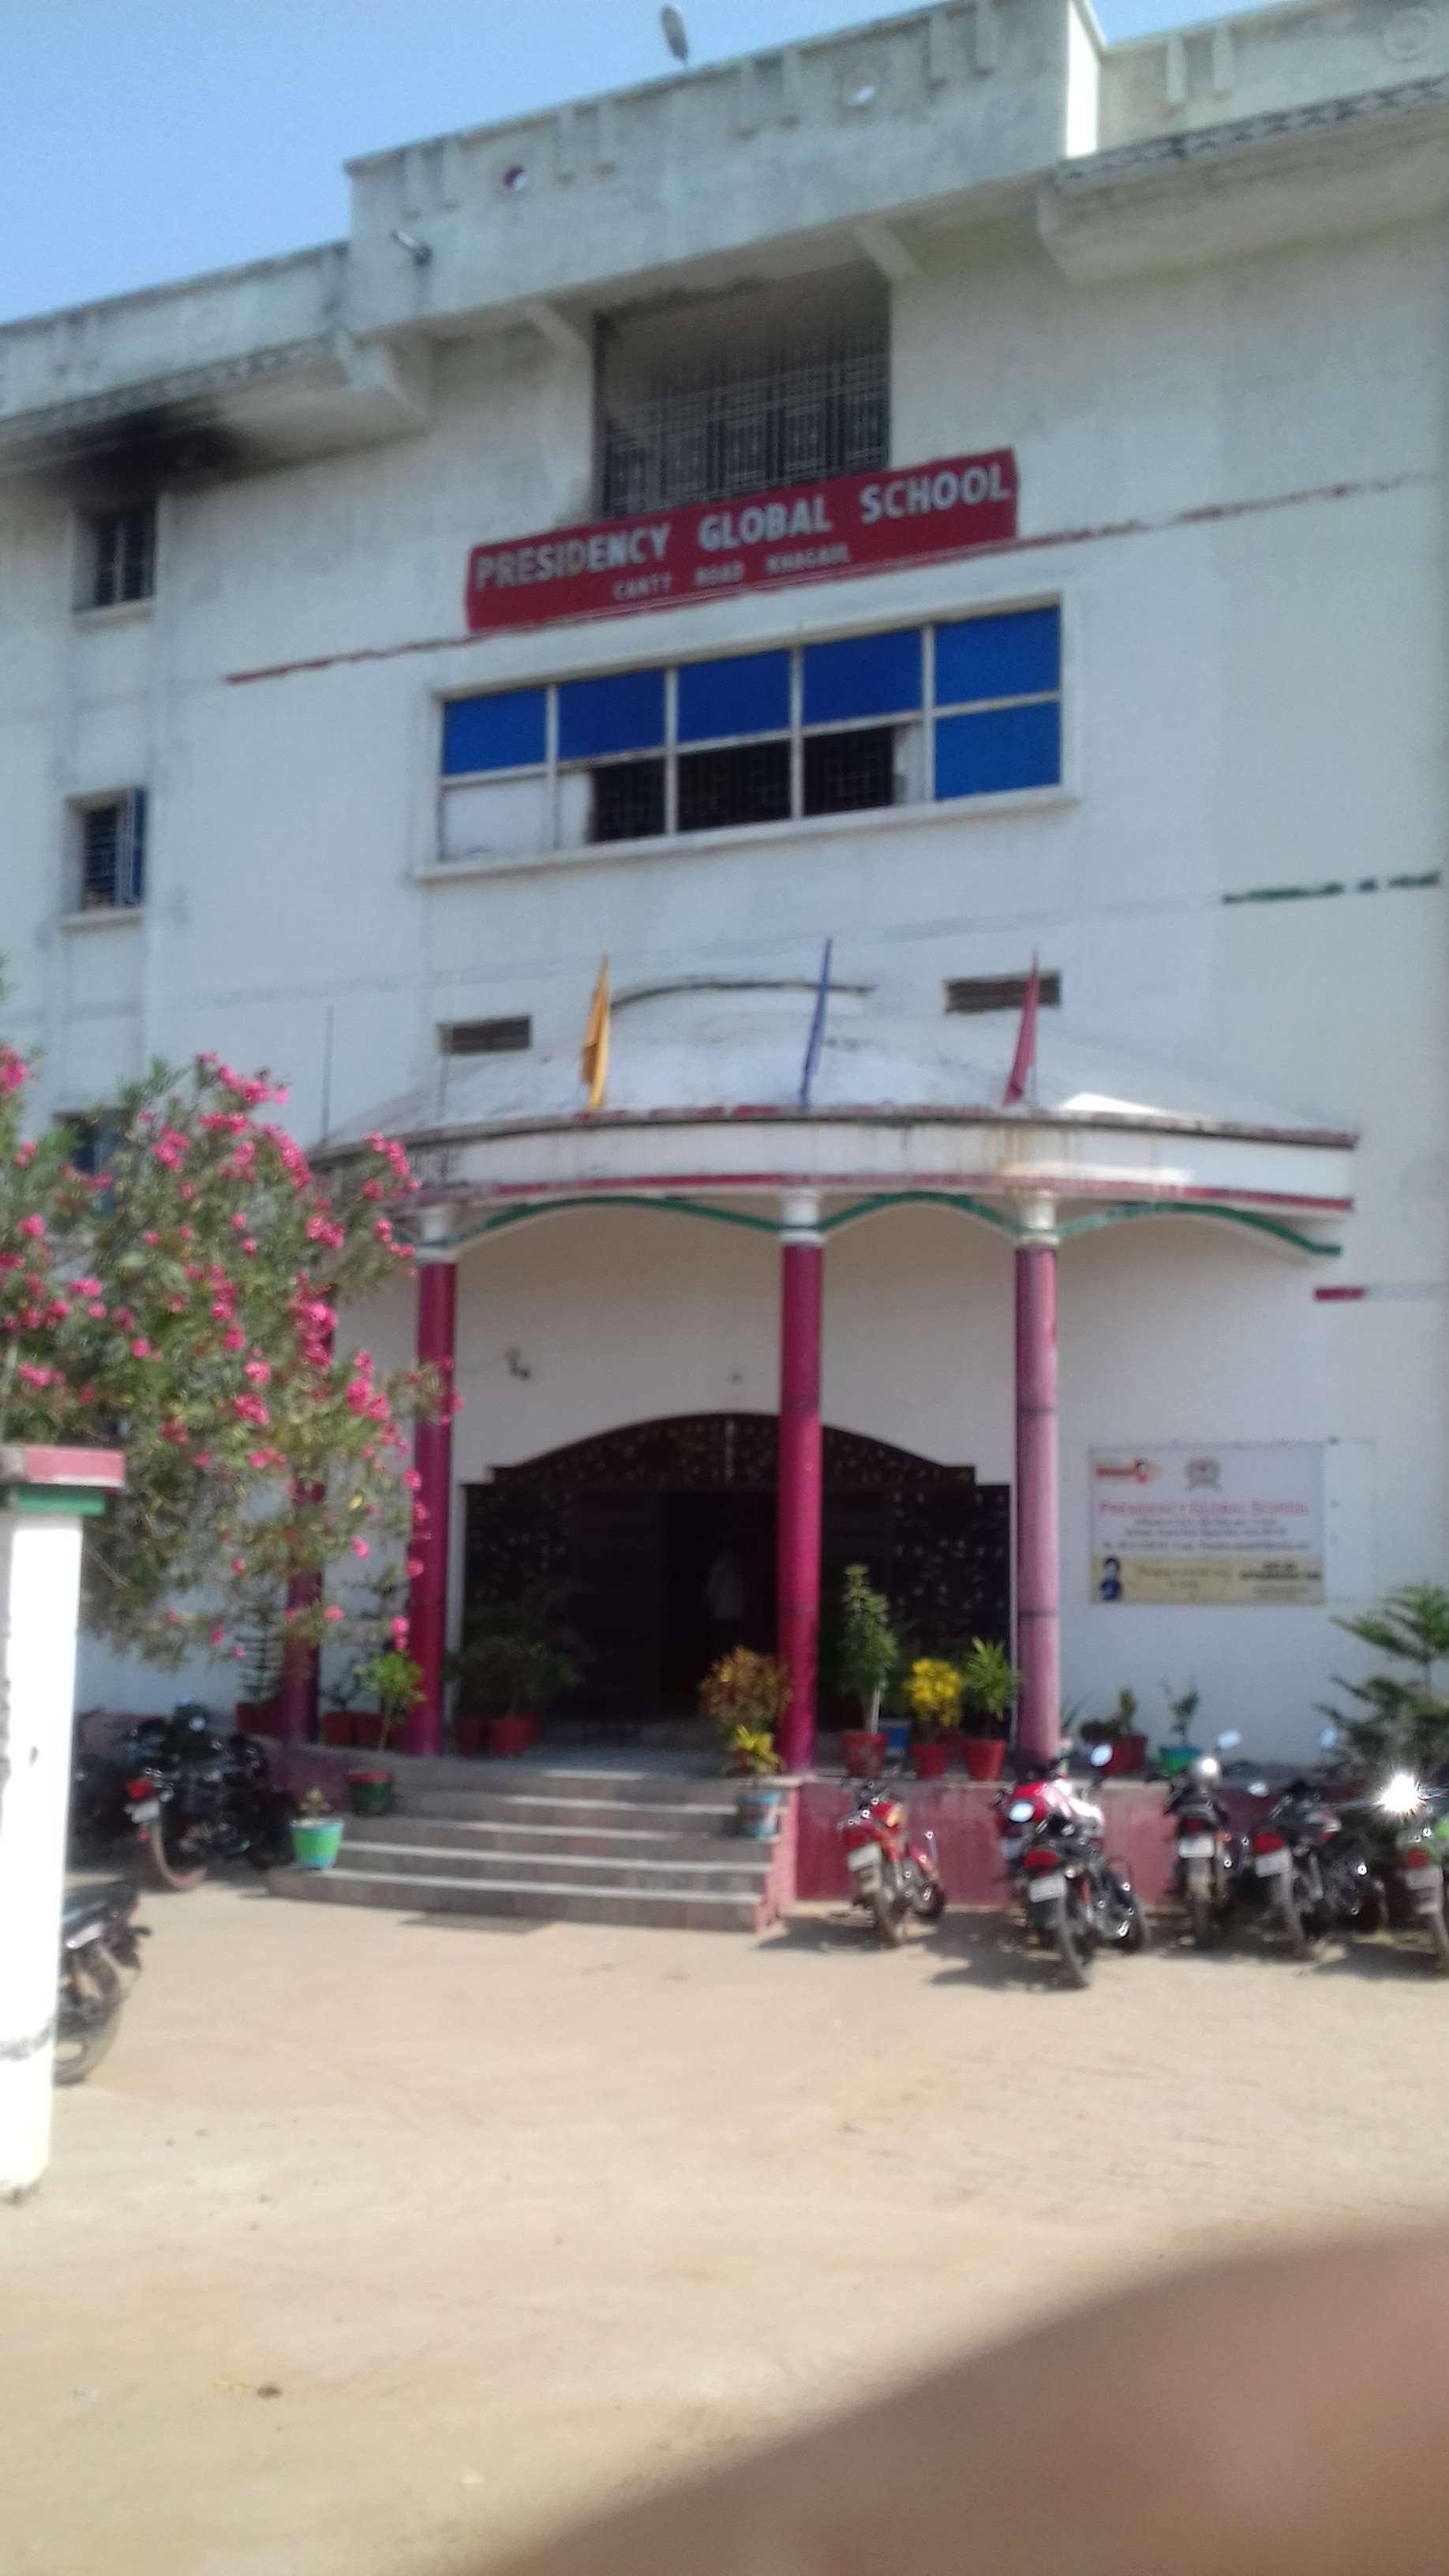 presidency global school cantt road khagaul patna 330279